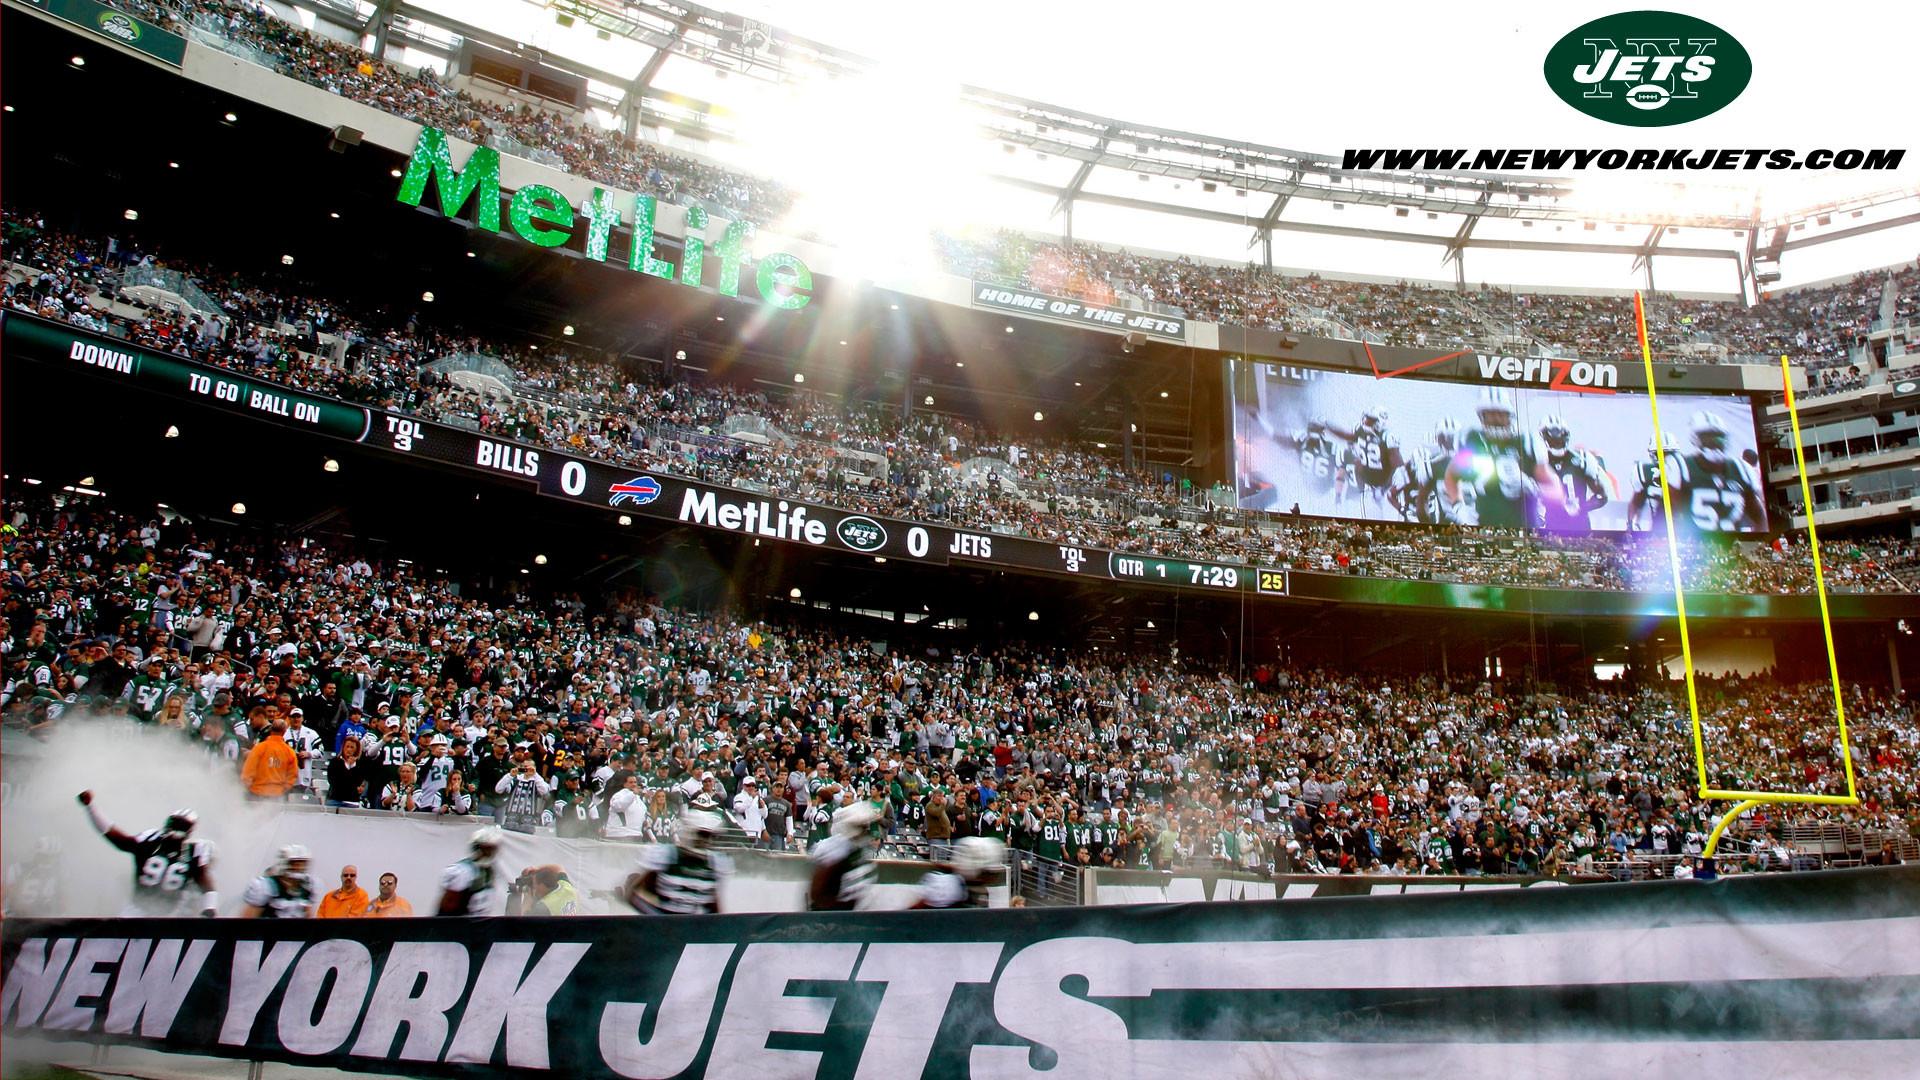 New York Jets Stadium Wallpaper Desktop Hd Backgrounds Hd Screensavers .